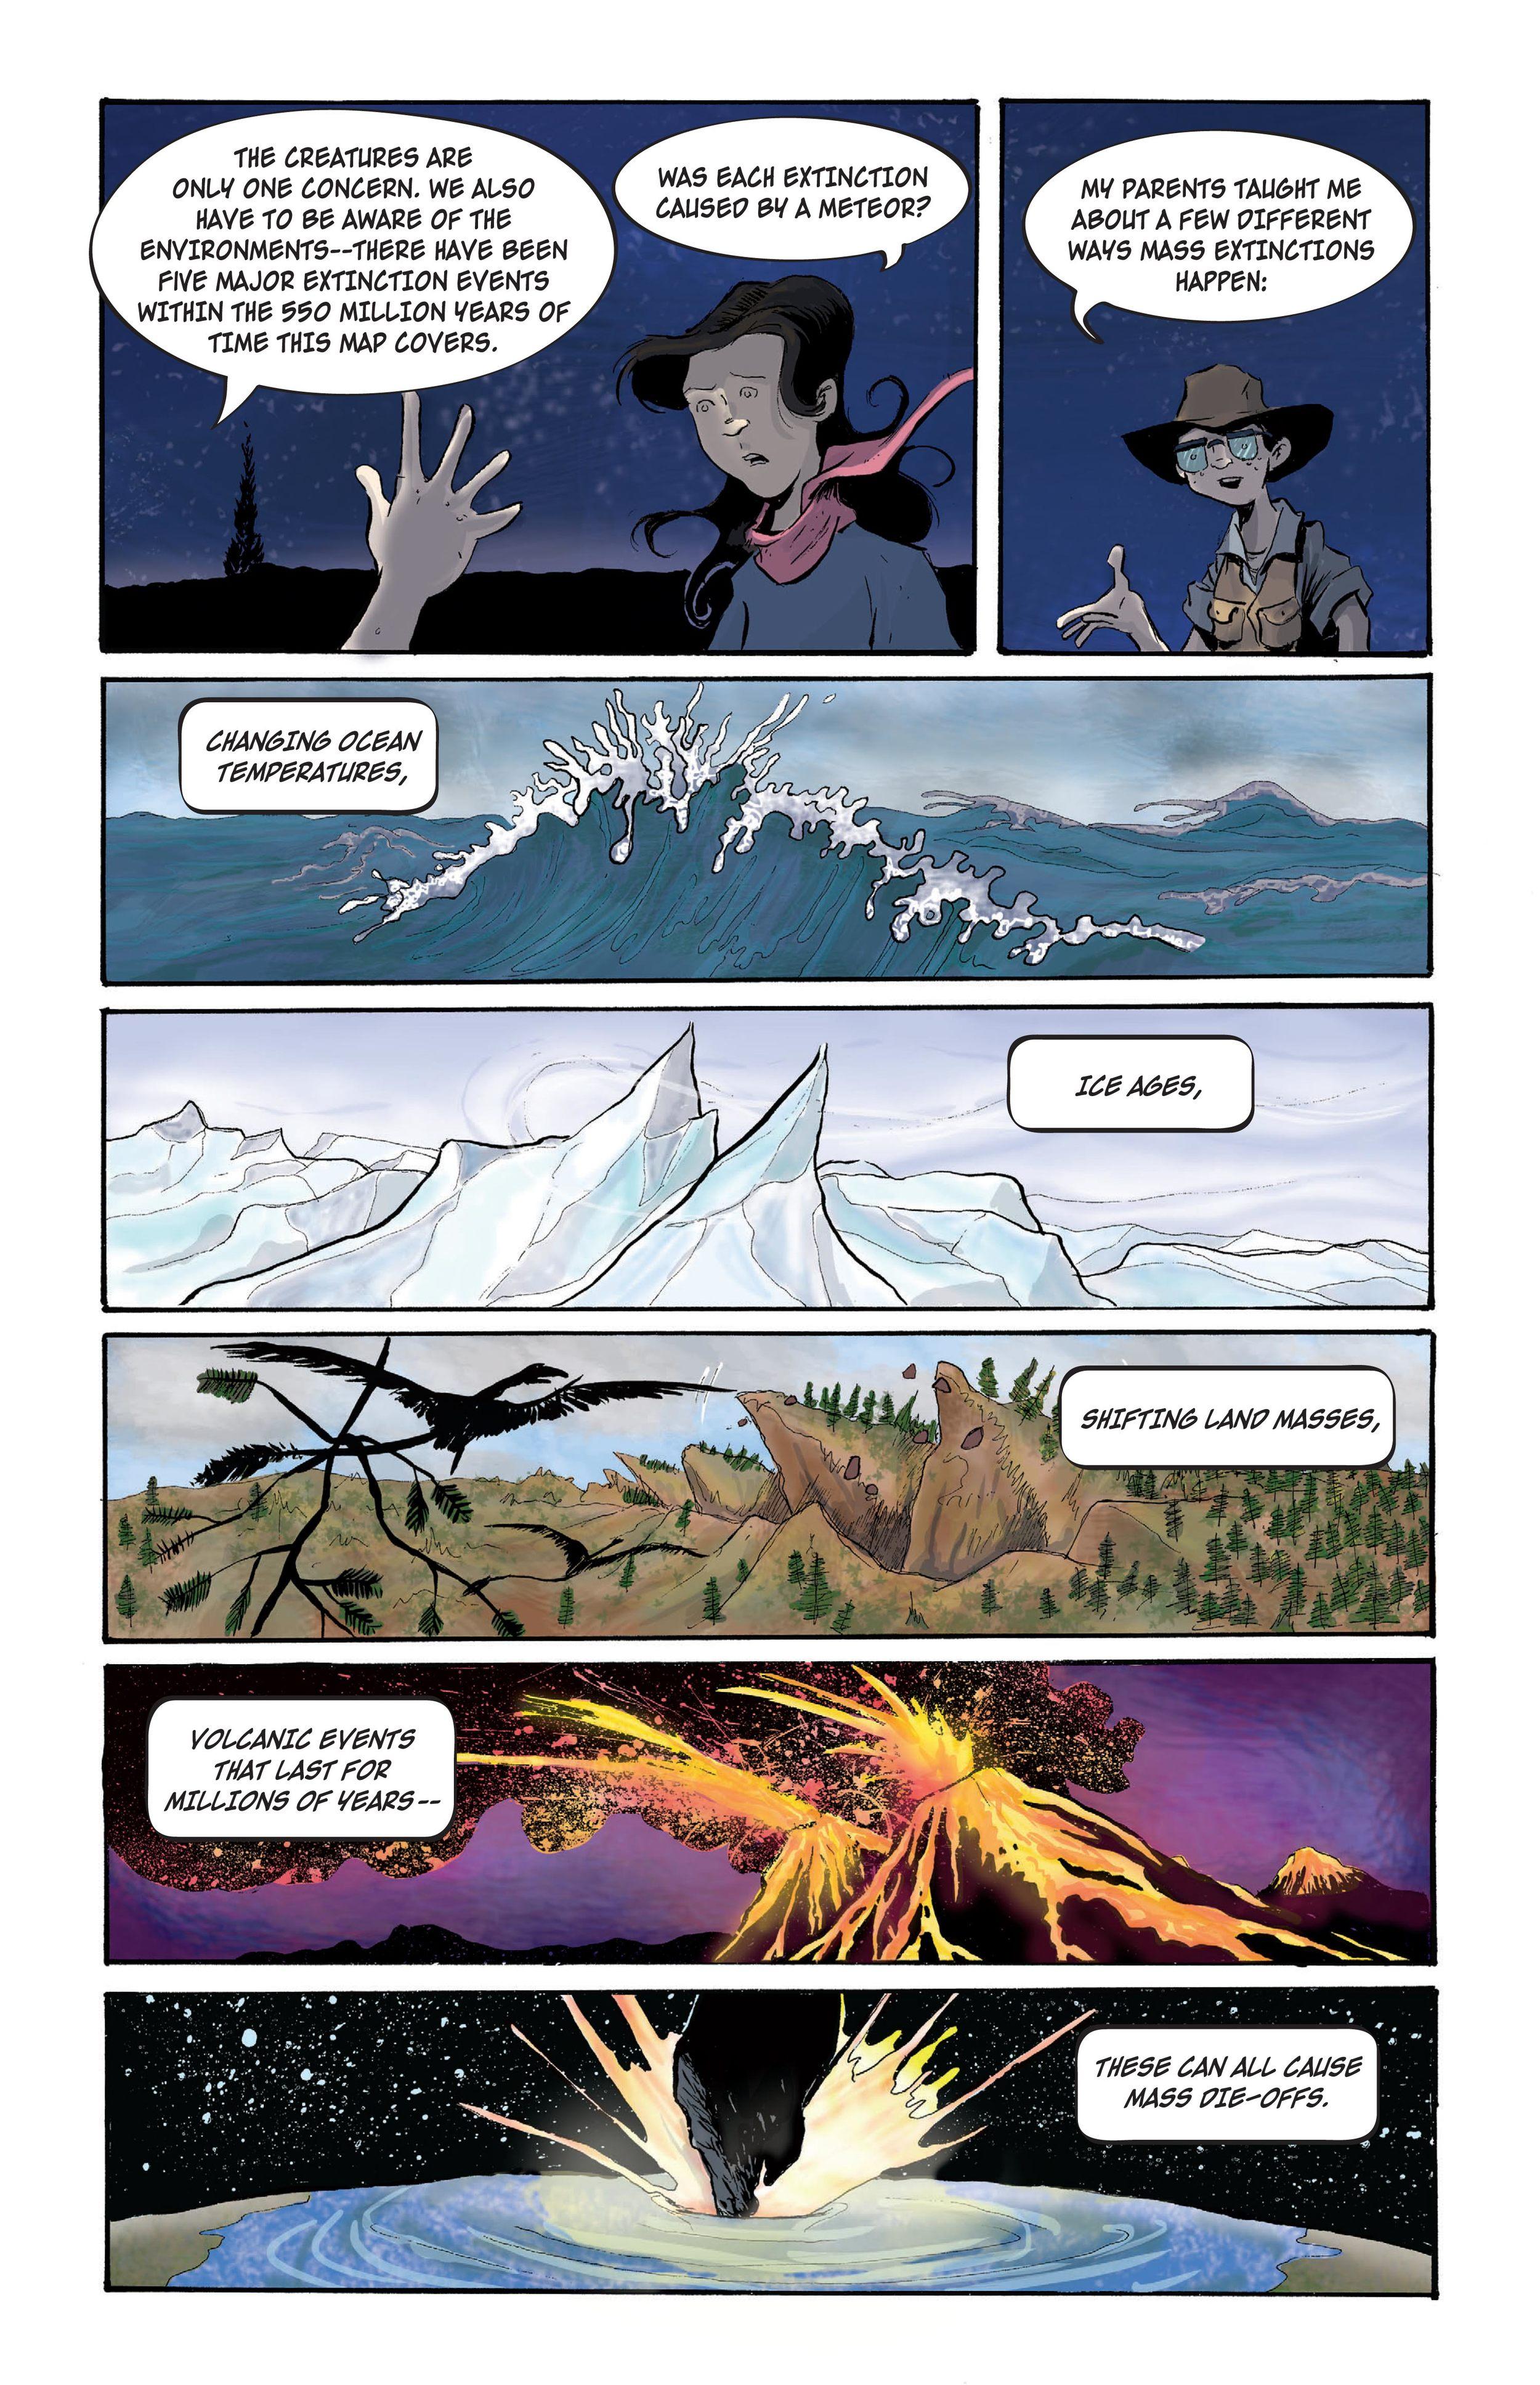 TT2-page019.jpg